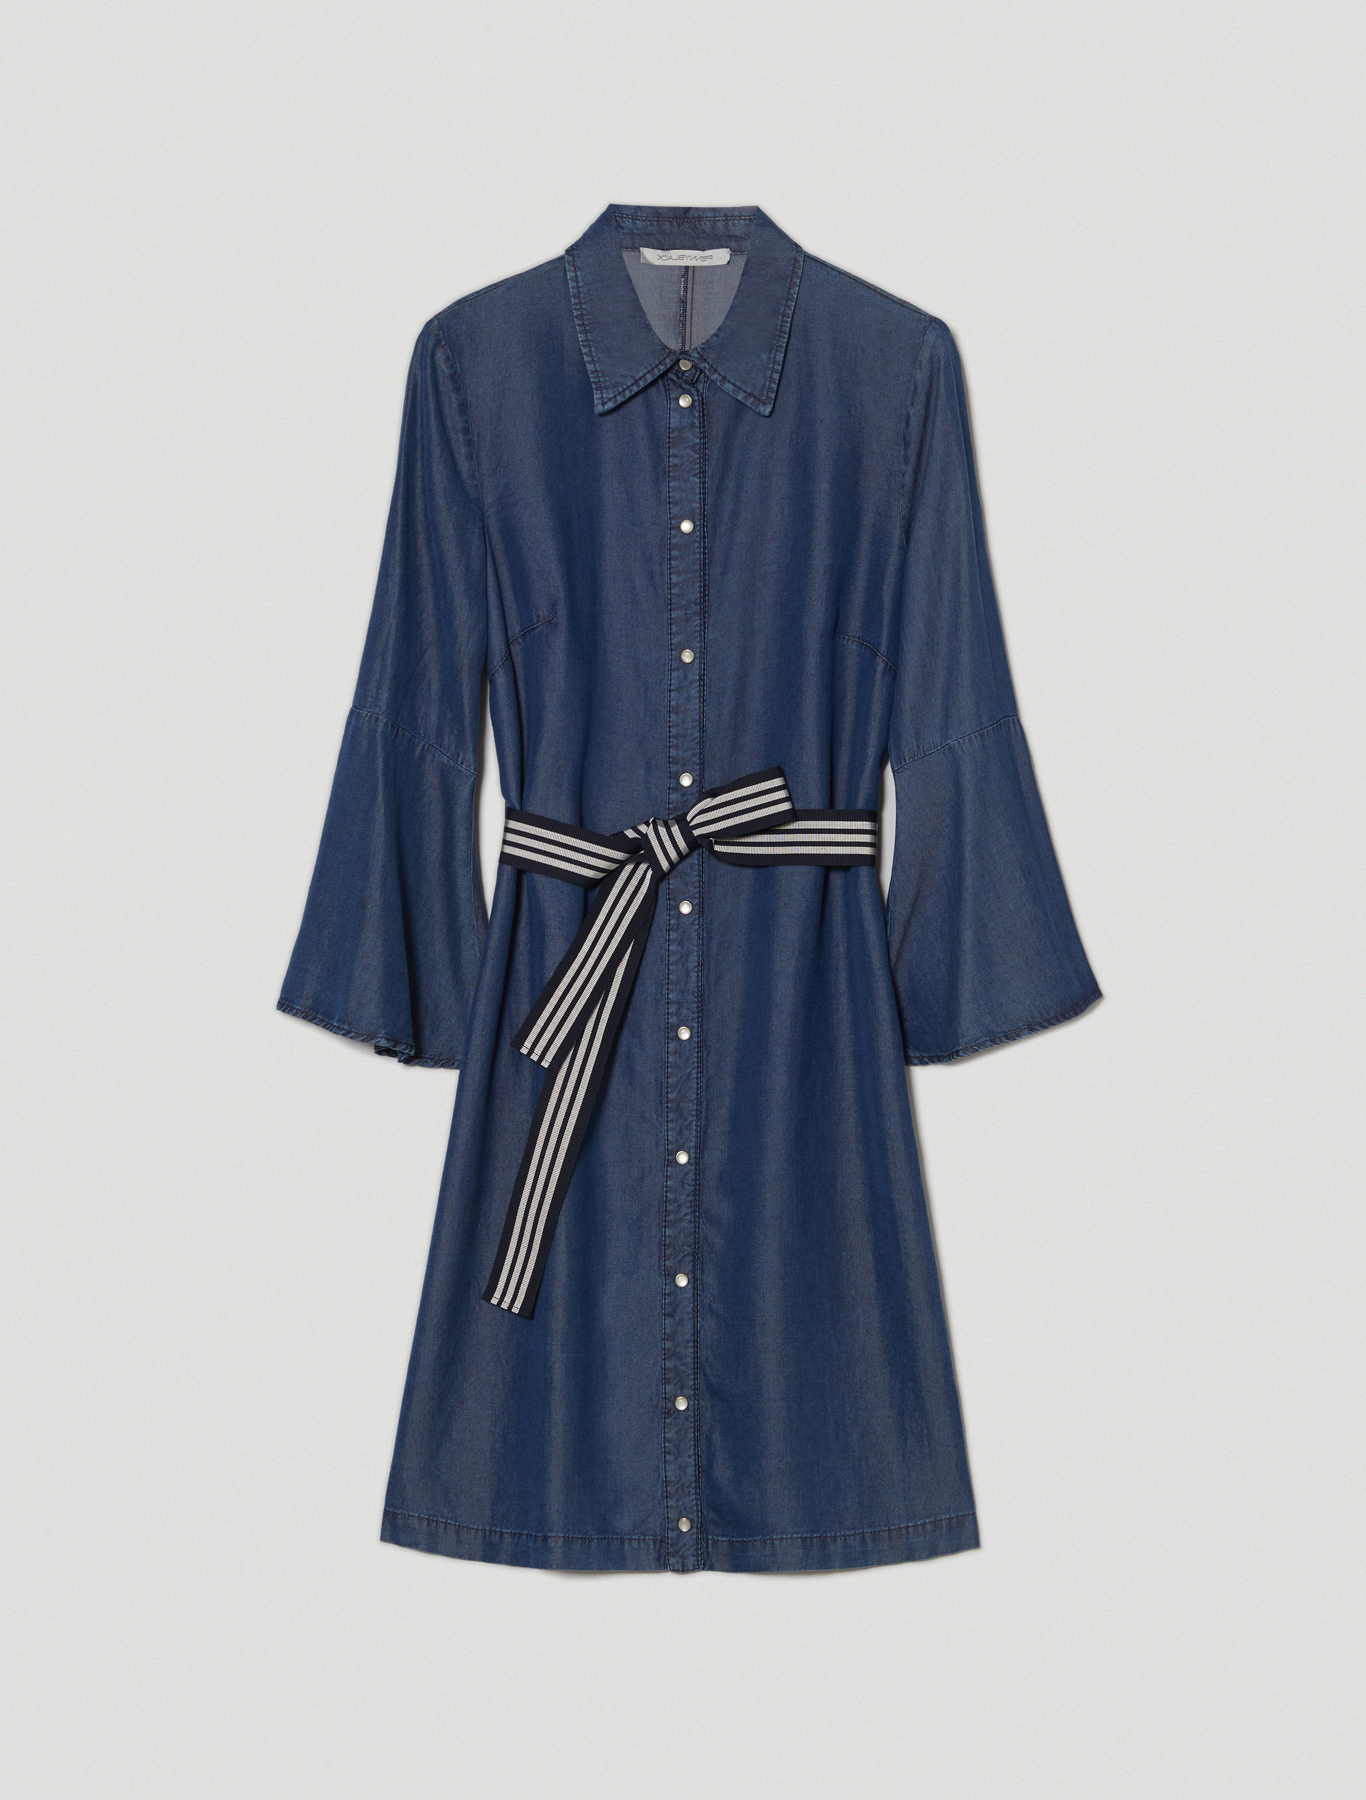 Flowing denim shirt dress - navy blue - pennyblack